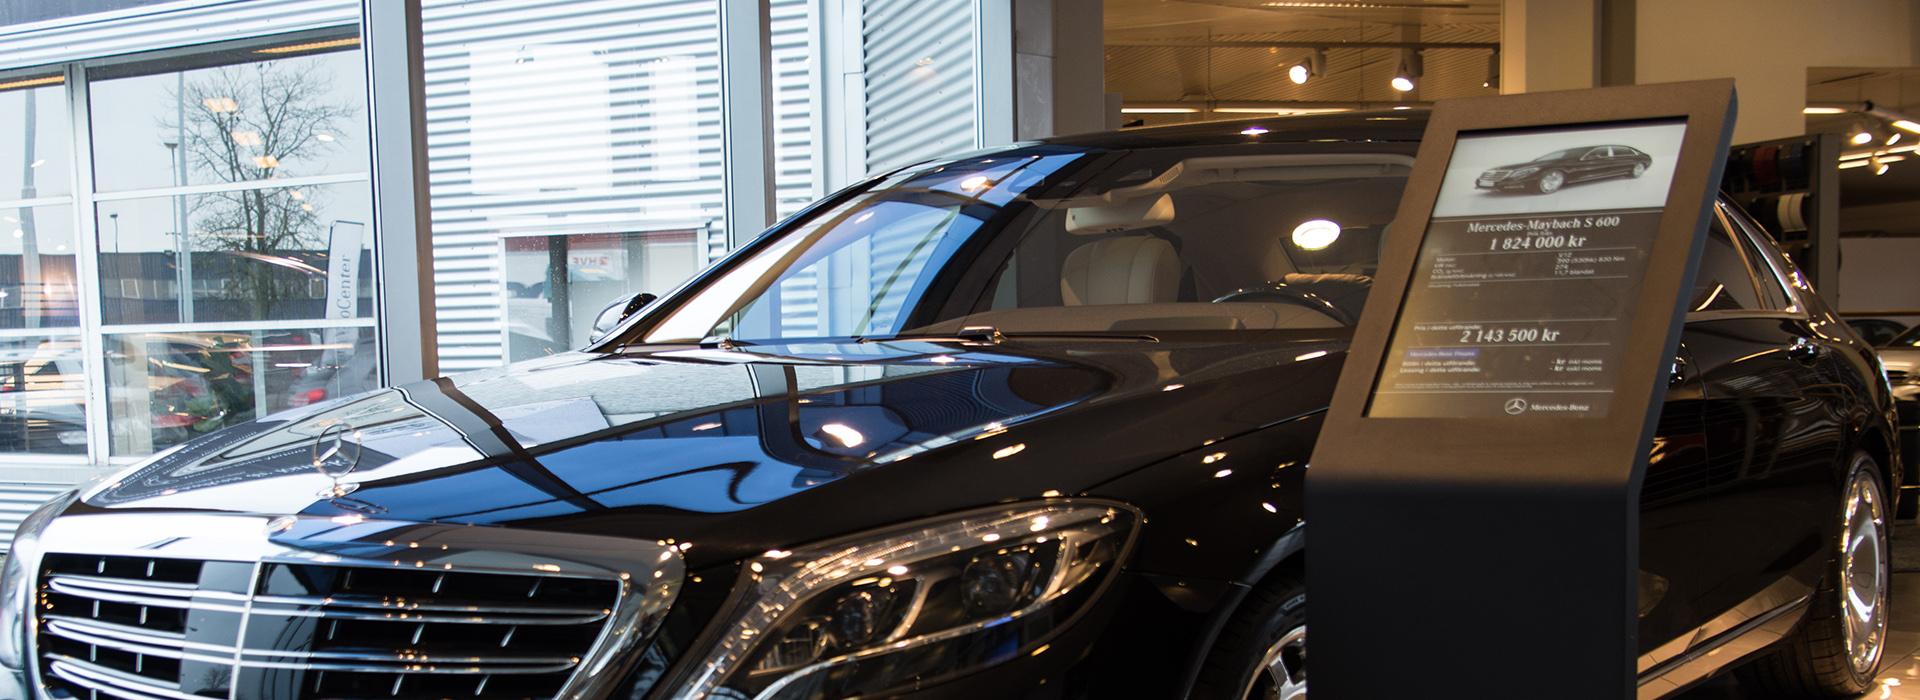 Mercedes Benz, a ZetaDisplay customer since 2013